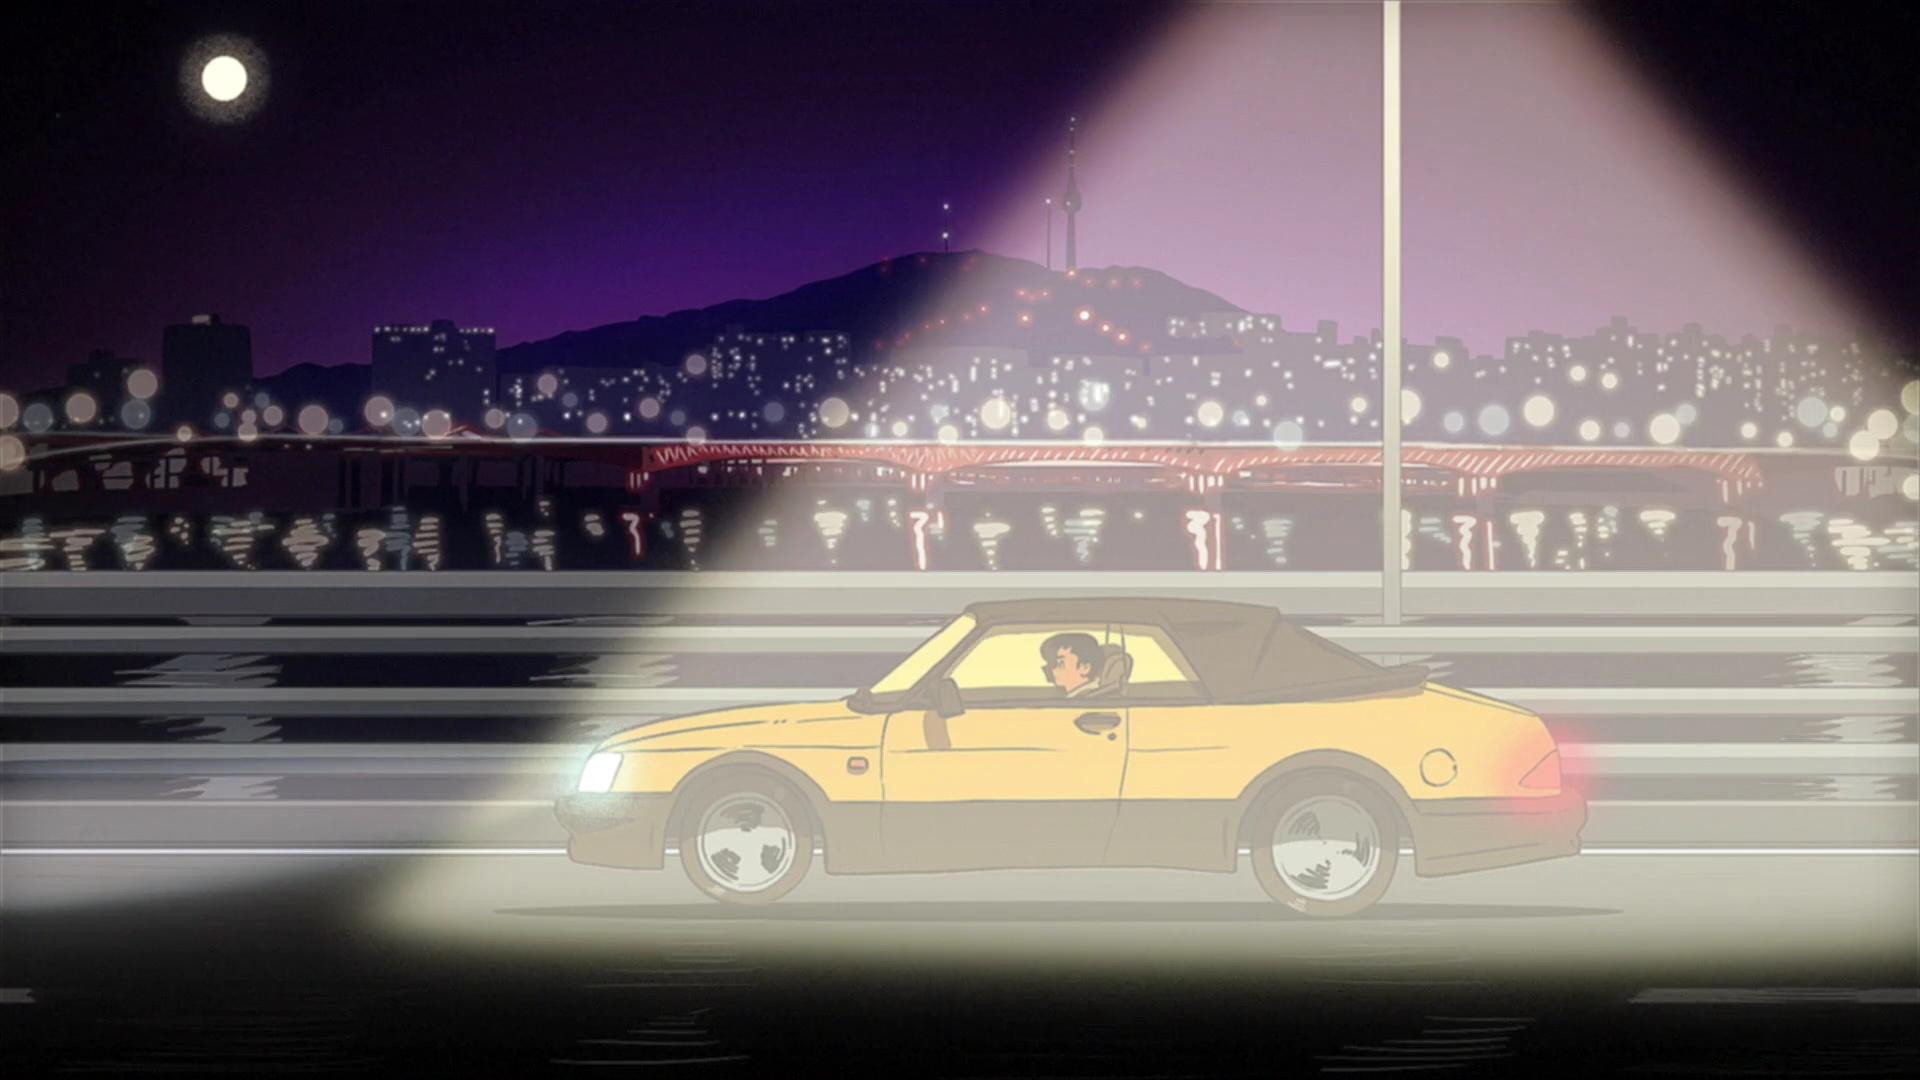 [MV] 2018 월간 윤종신 10월호 - Night Drive